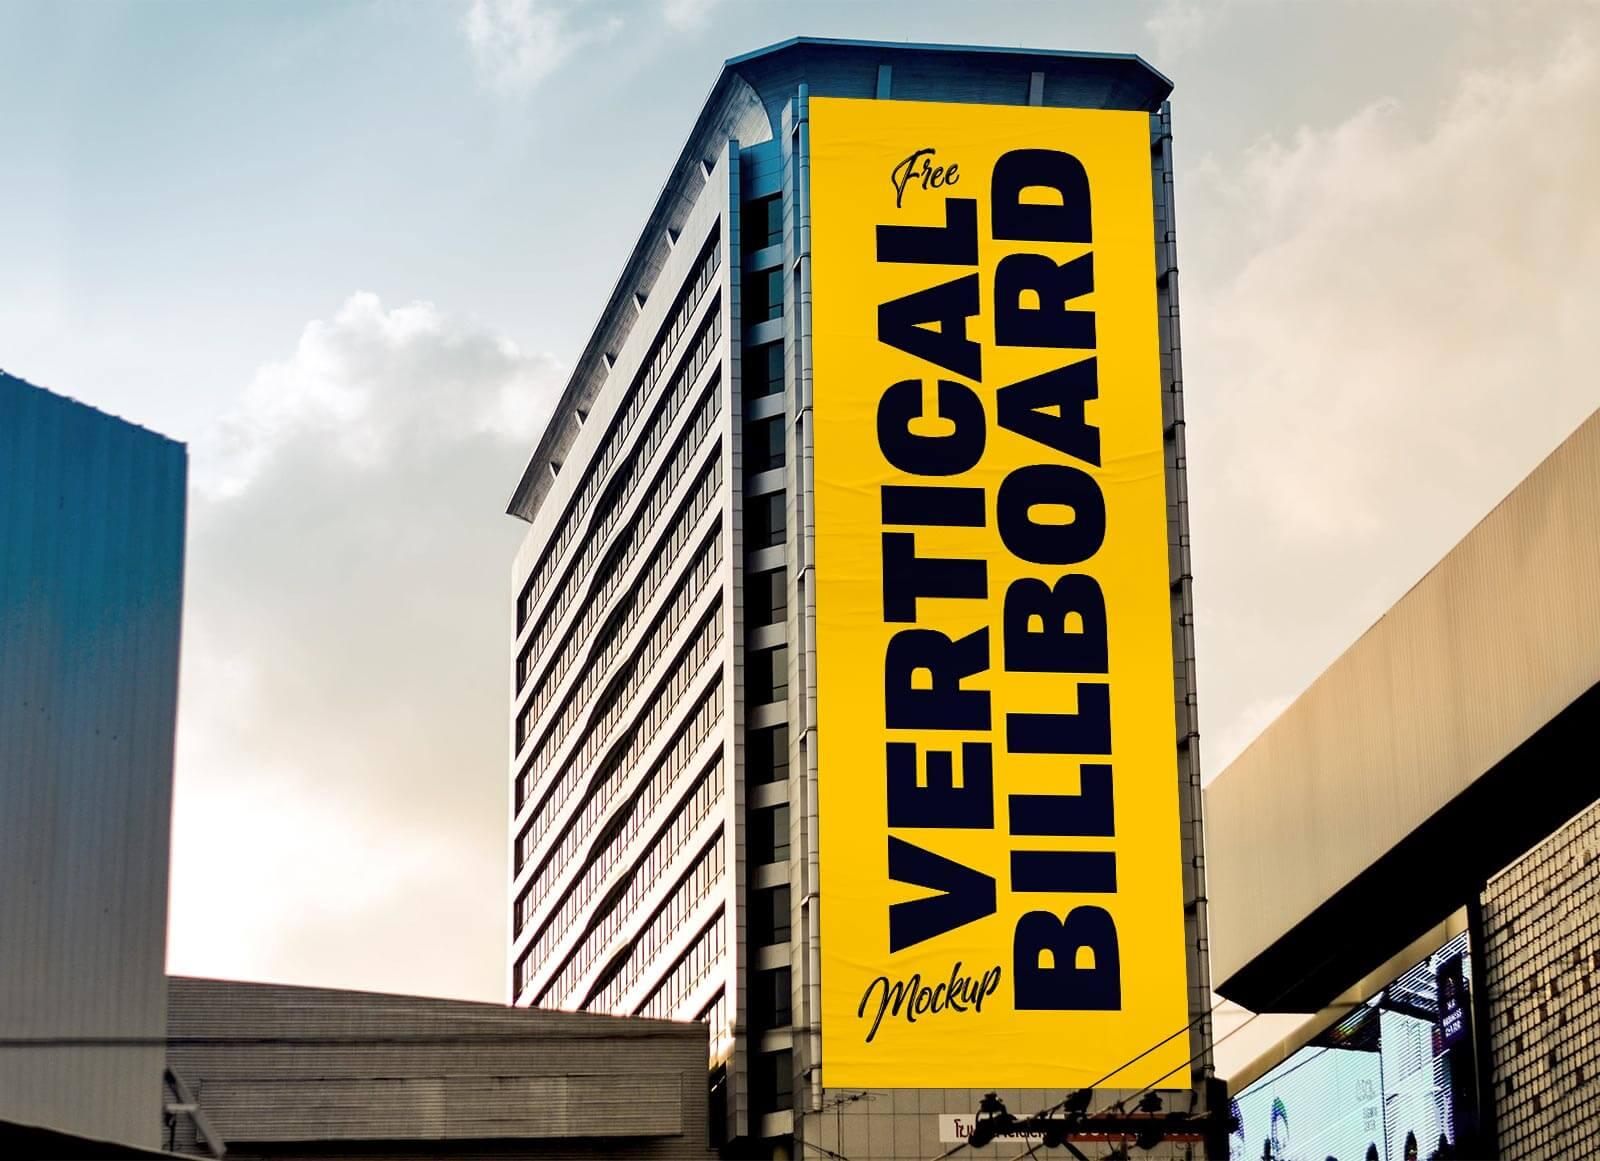 Free-Vertical-Building-Billboard-Mockup-PSD